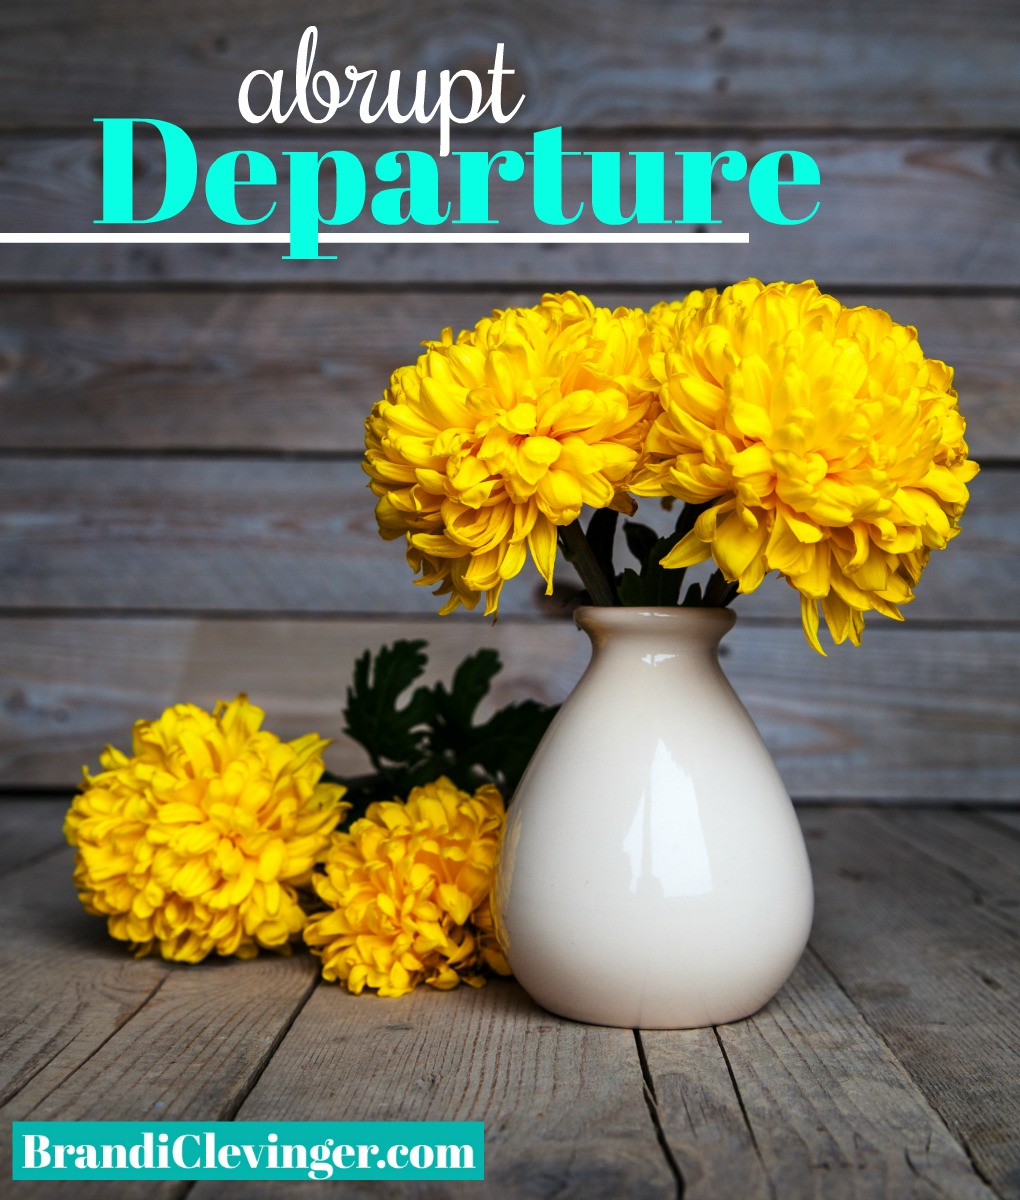 abrupt departure #brandiclevinger